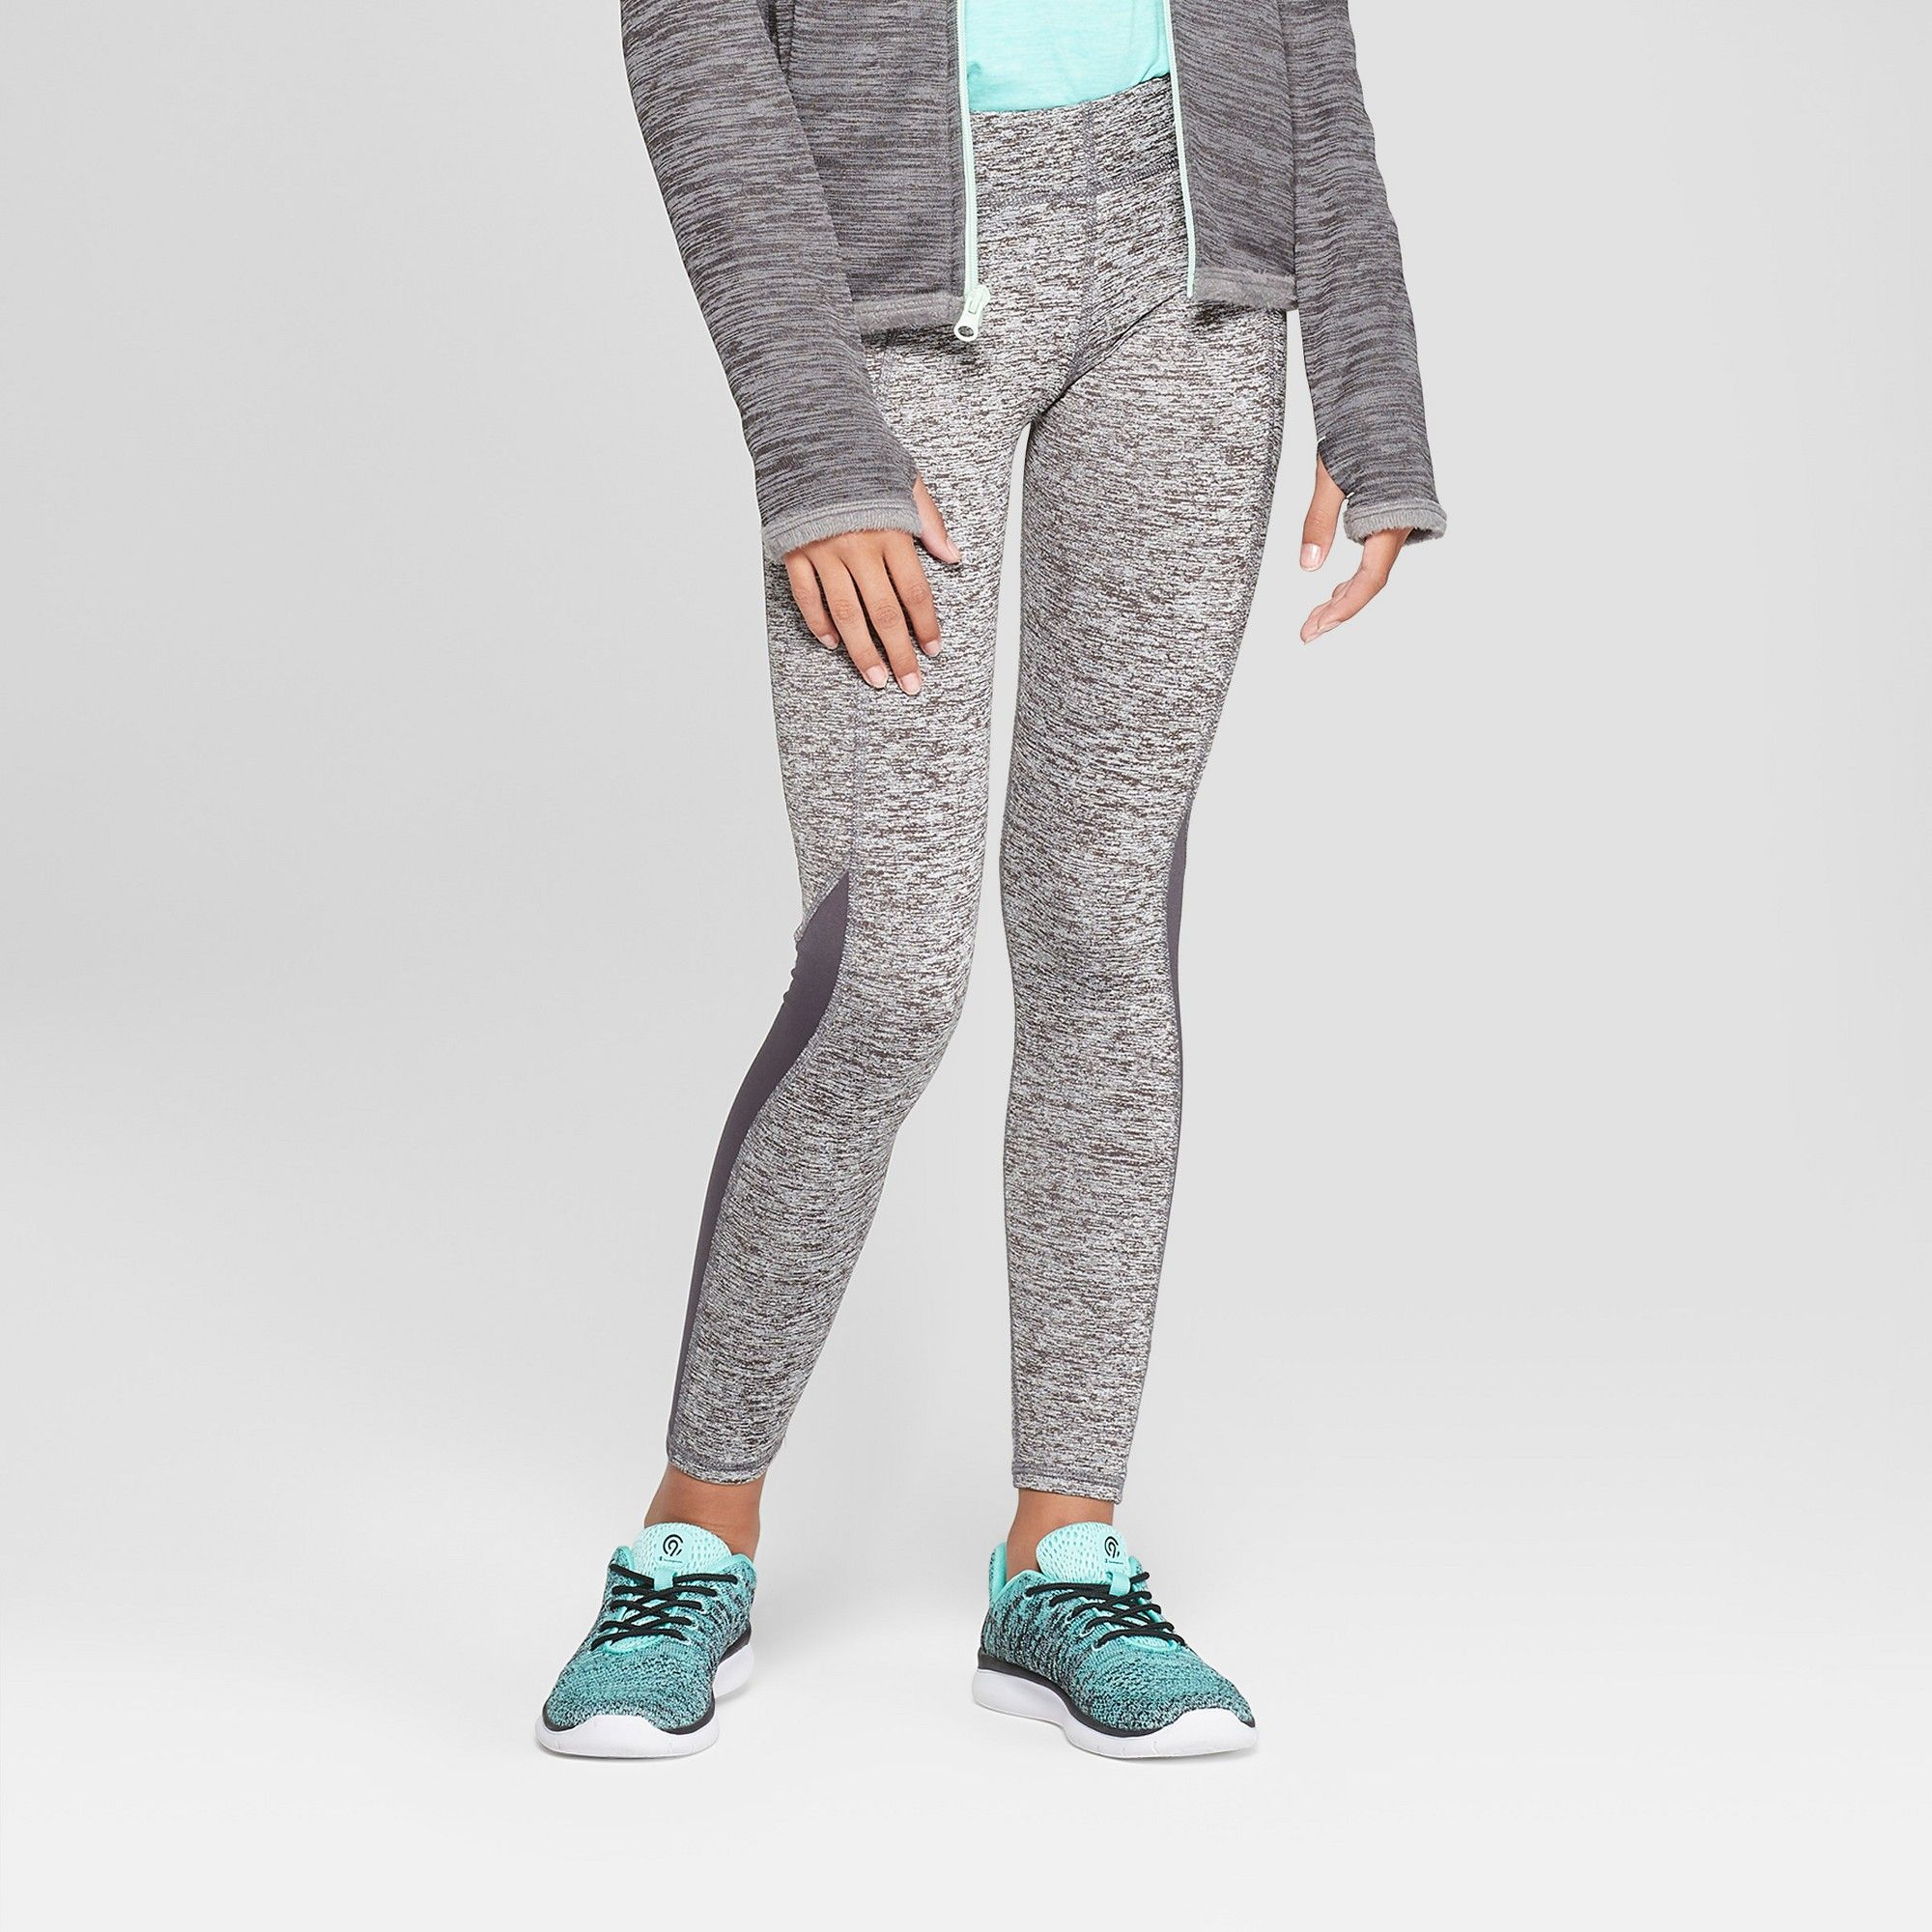 fb441190da91 Girls  Cozy Performance Leggings With Pockets - C9 Champion Heather Grey XS